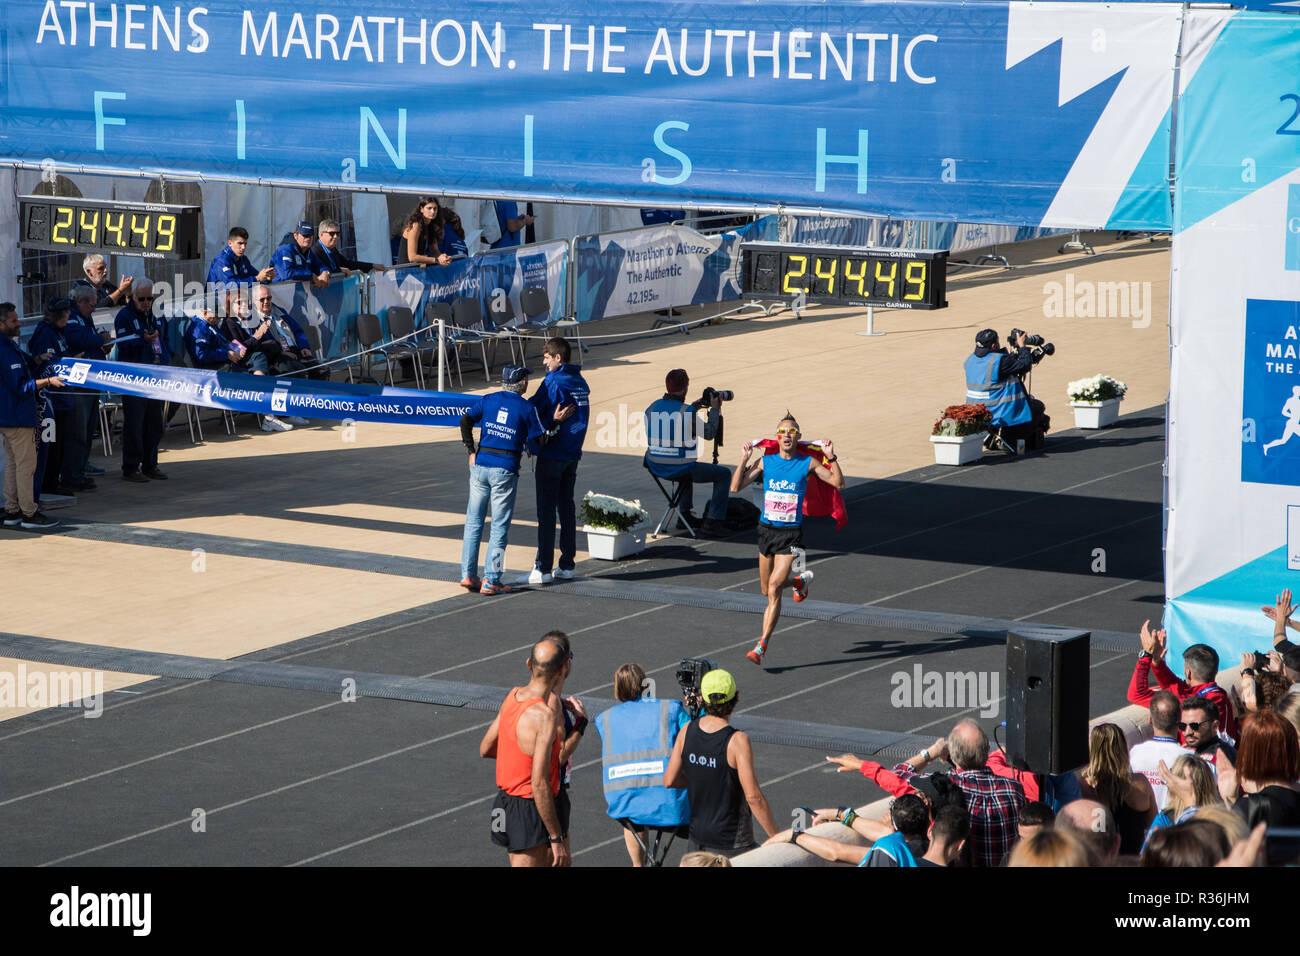 36th Athens Authentic Marathon. Ma Liang Wu from China crossing the finish line at Panathenaic stadium Stock Photo